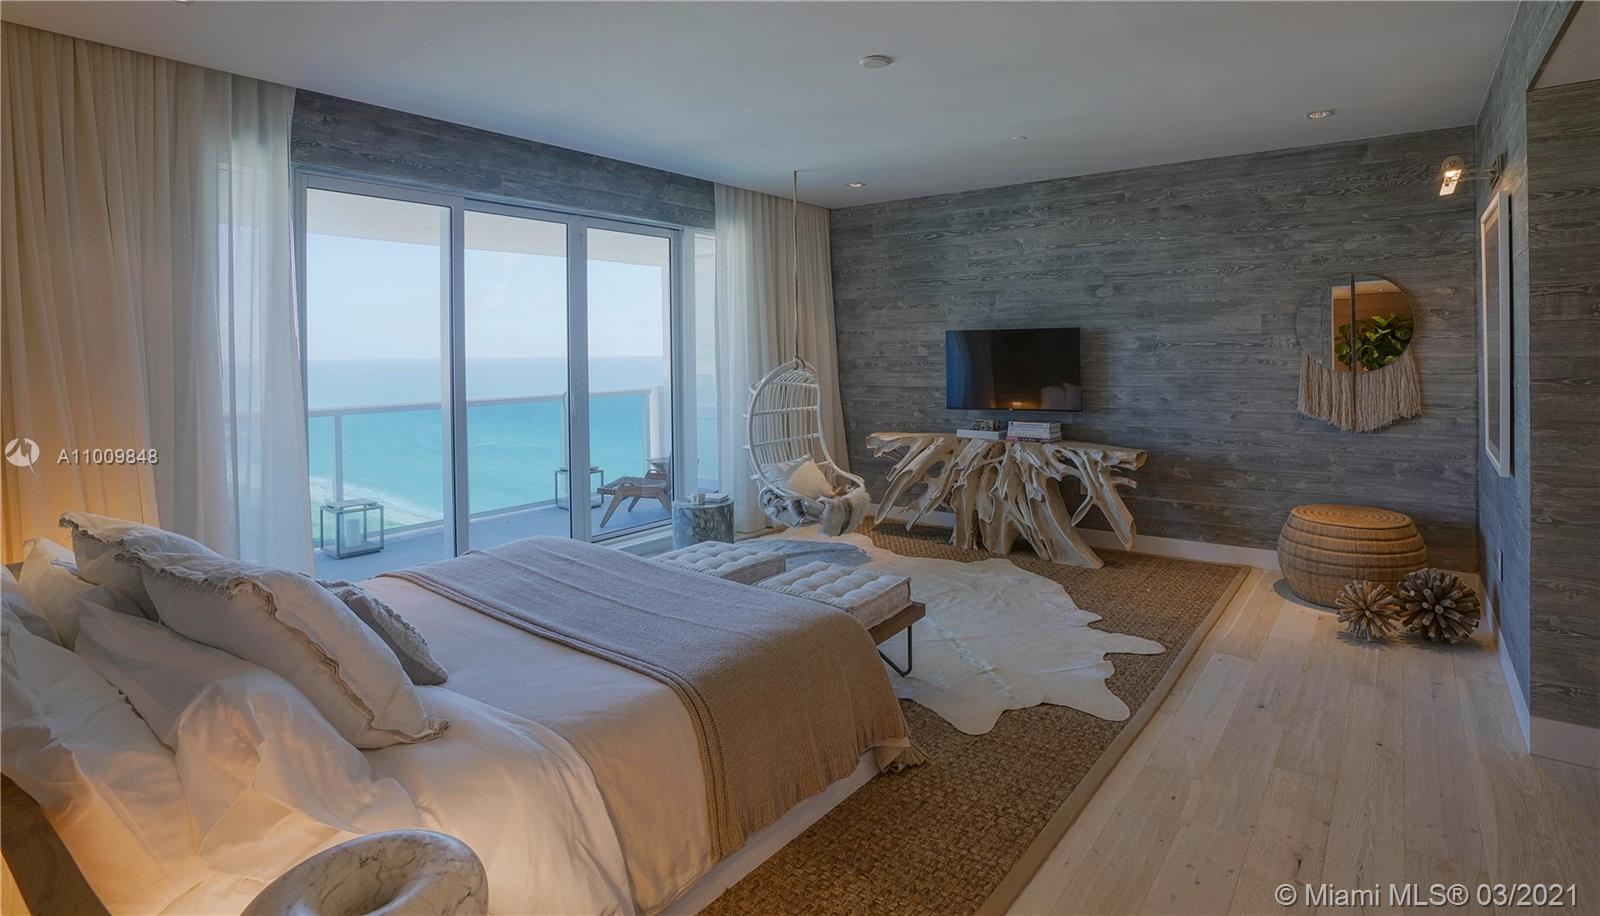 102 24th St, Unit #PH-1707 Luxury Real Estate